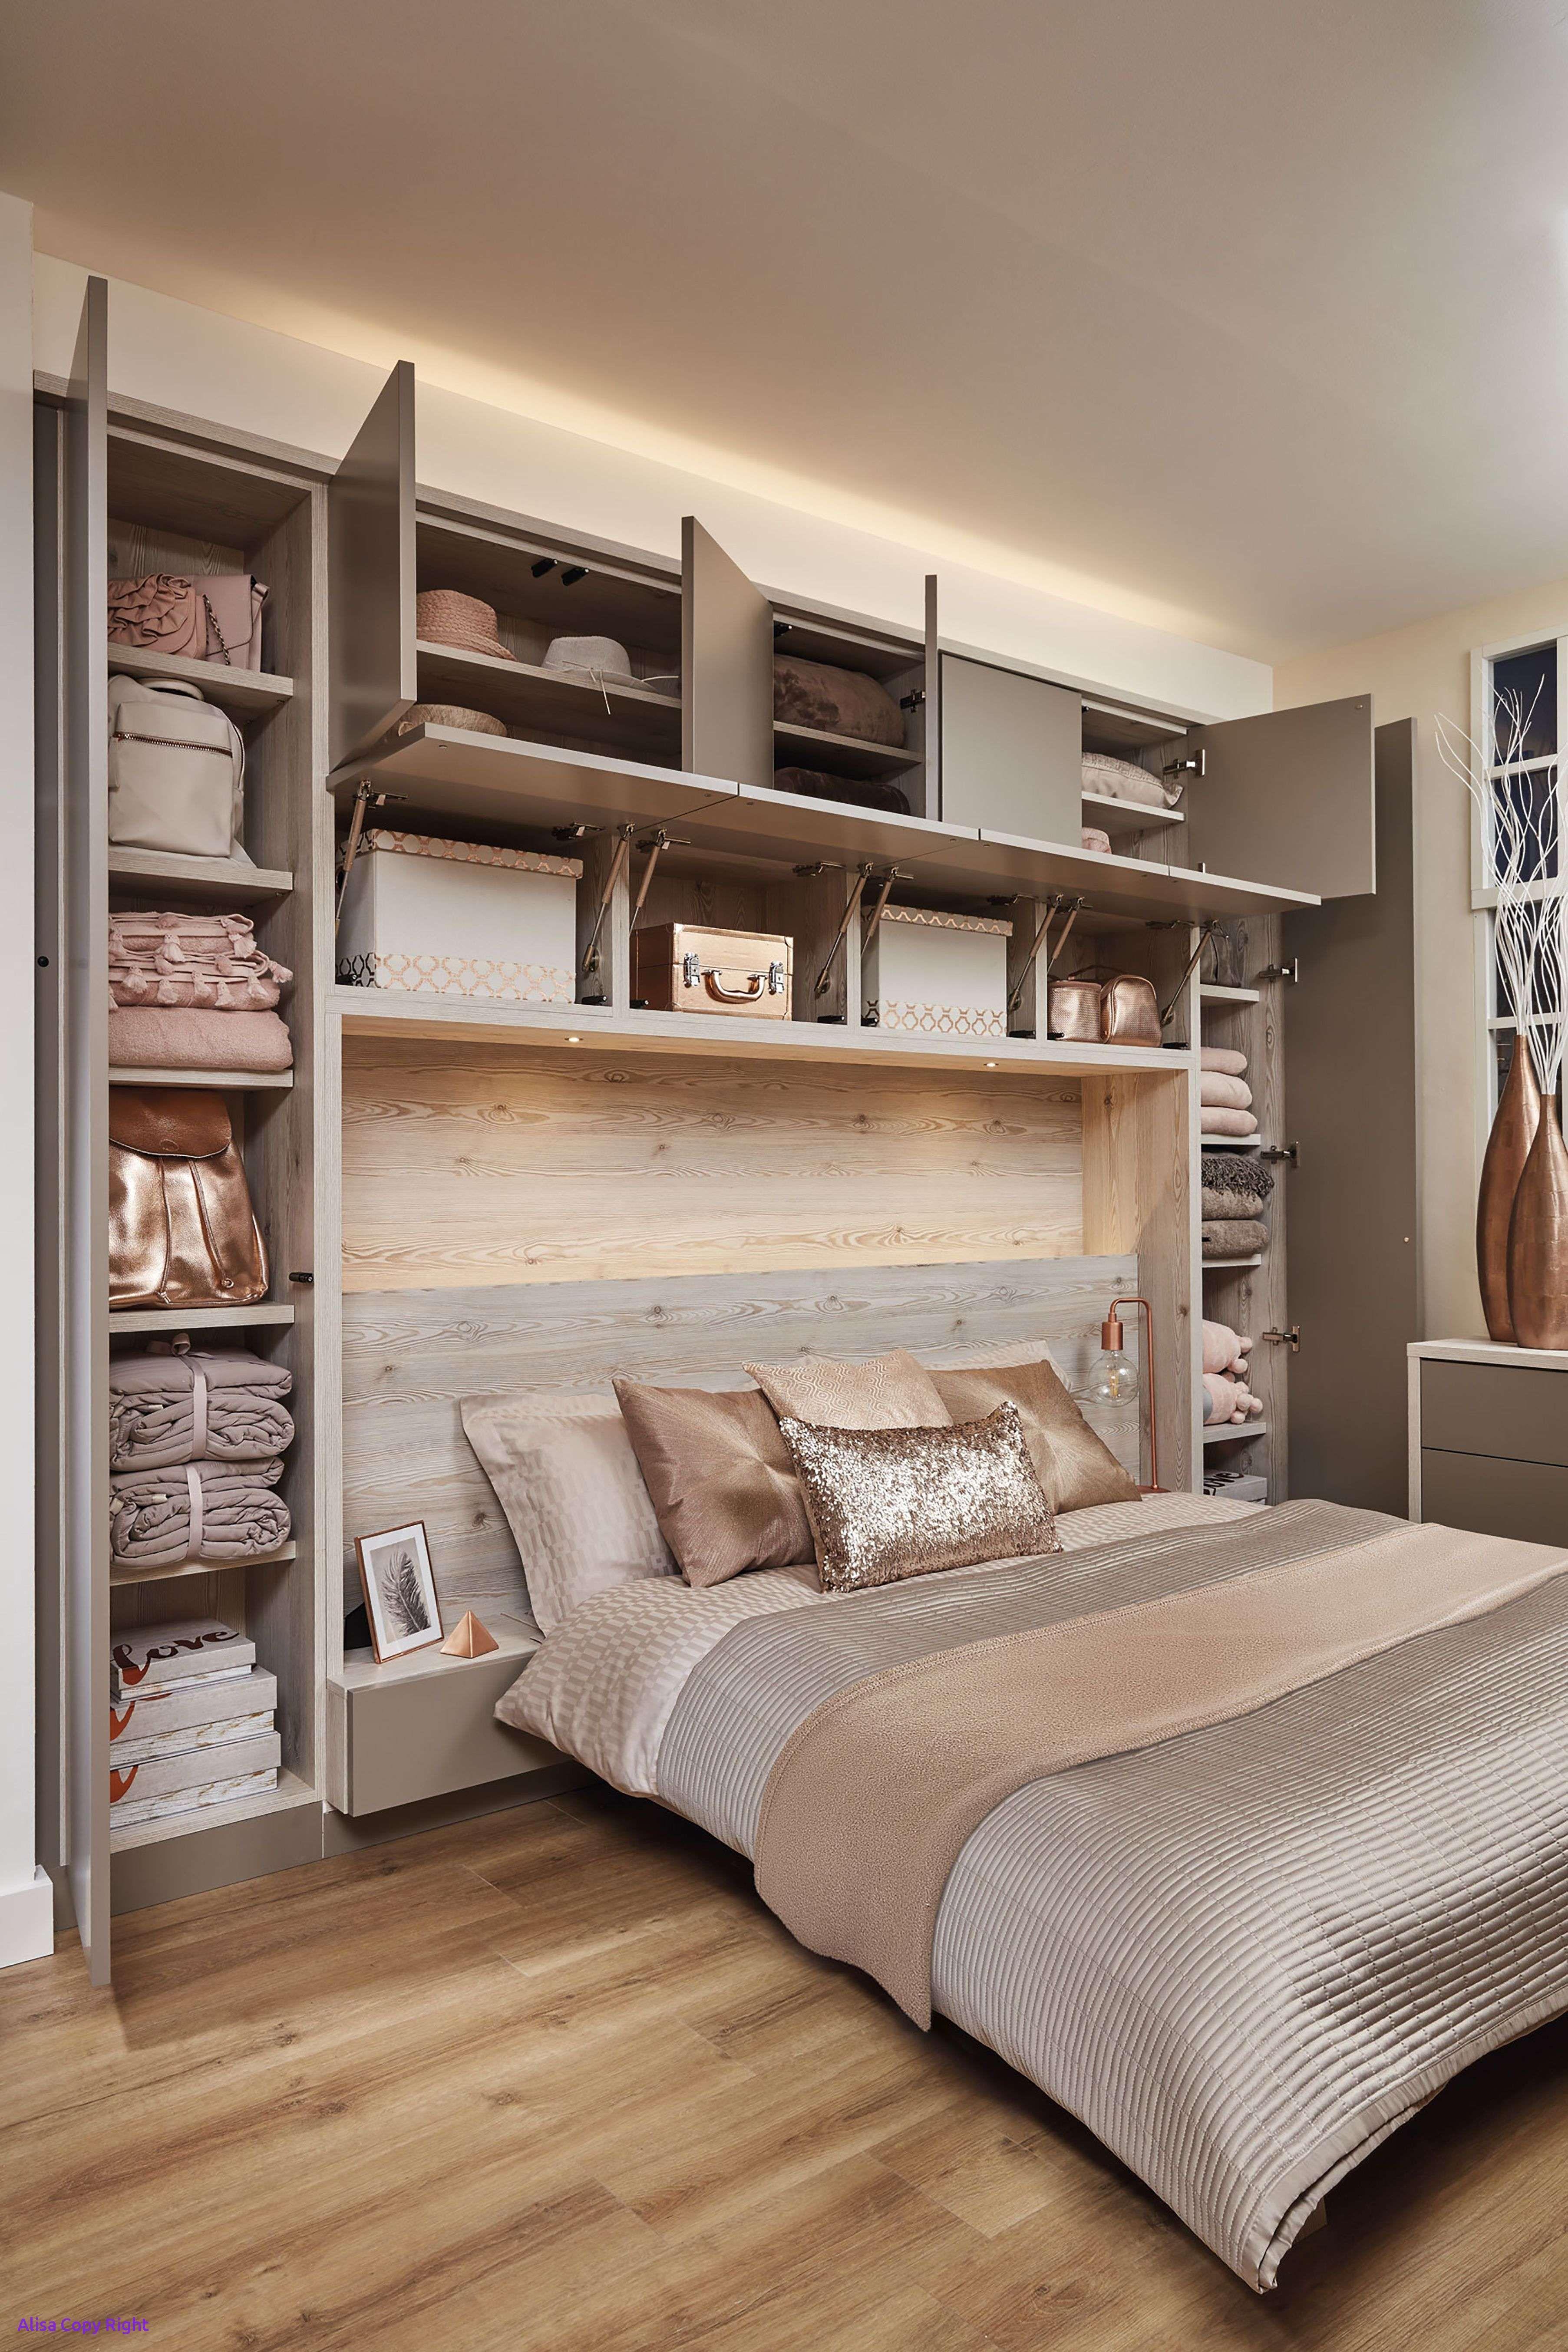 Ikea Small Bedroom Ideas 2019